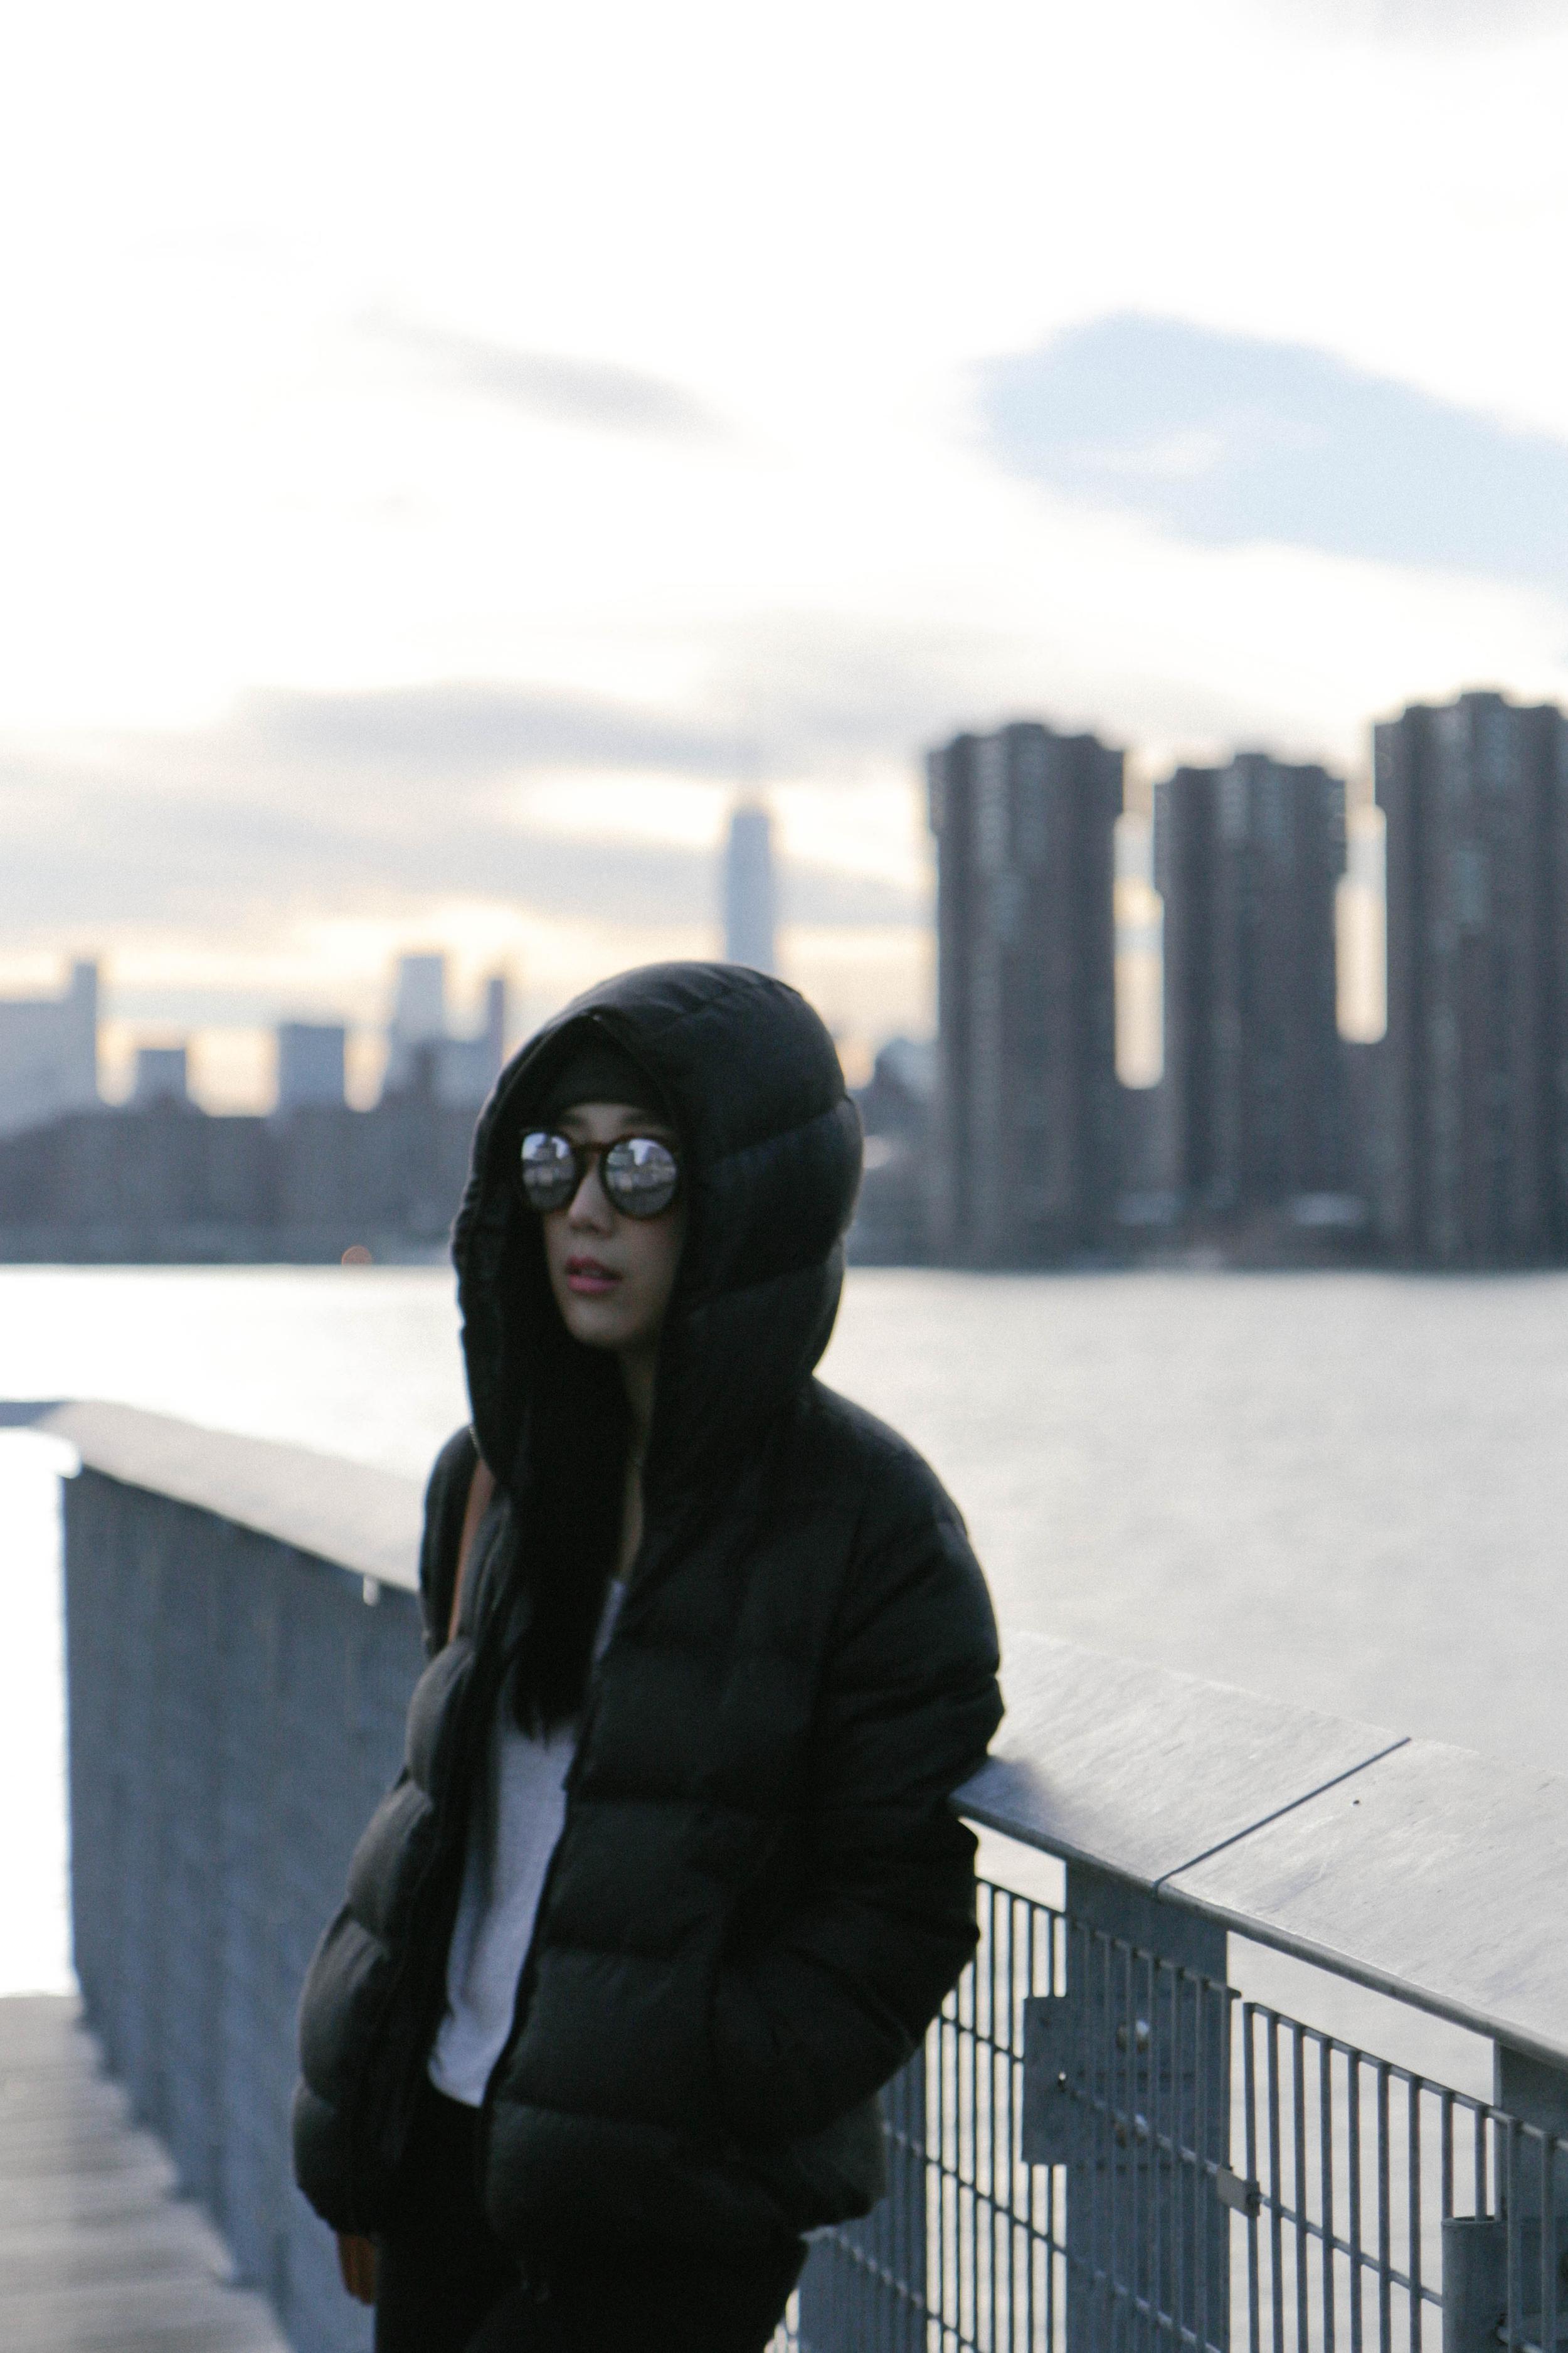 Duvetica Jacket,  T by Alexander Wang Top ,  Frame Denim Jeans , Céline Bag, Balenciaga Shoes,  Illesteva Sunglasses , Asos Beanie